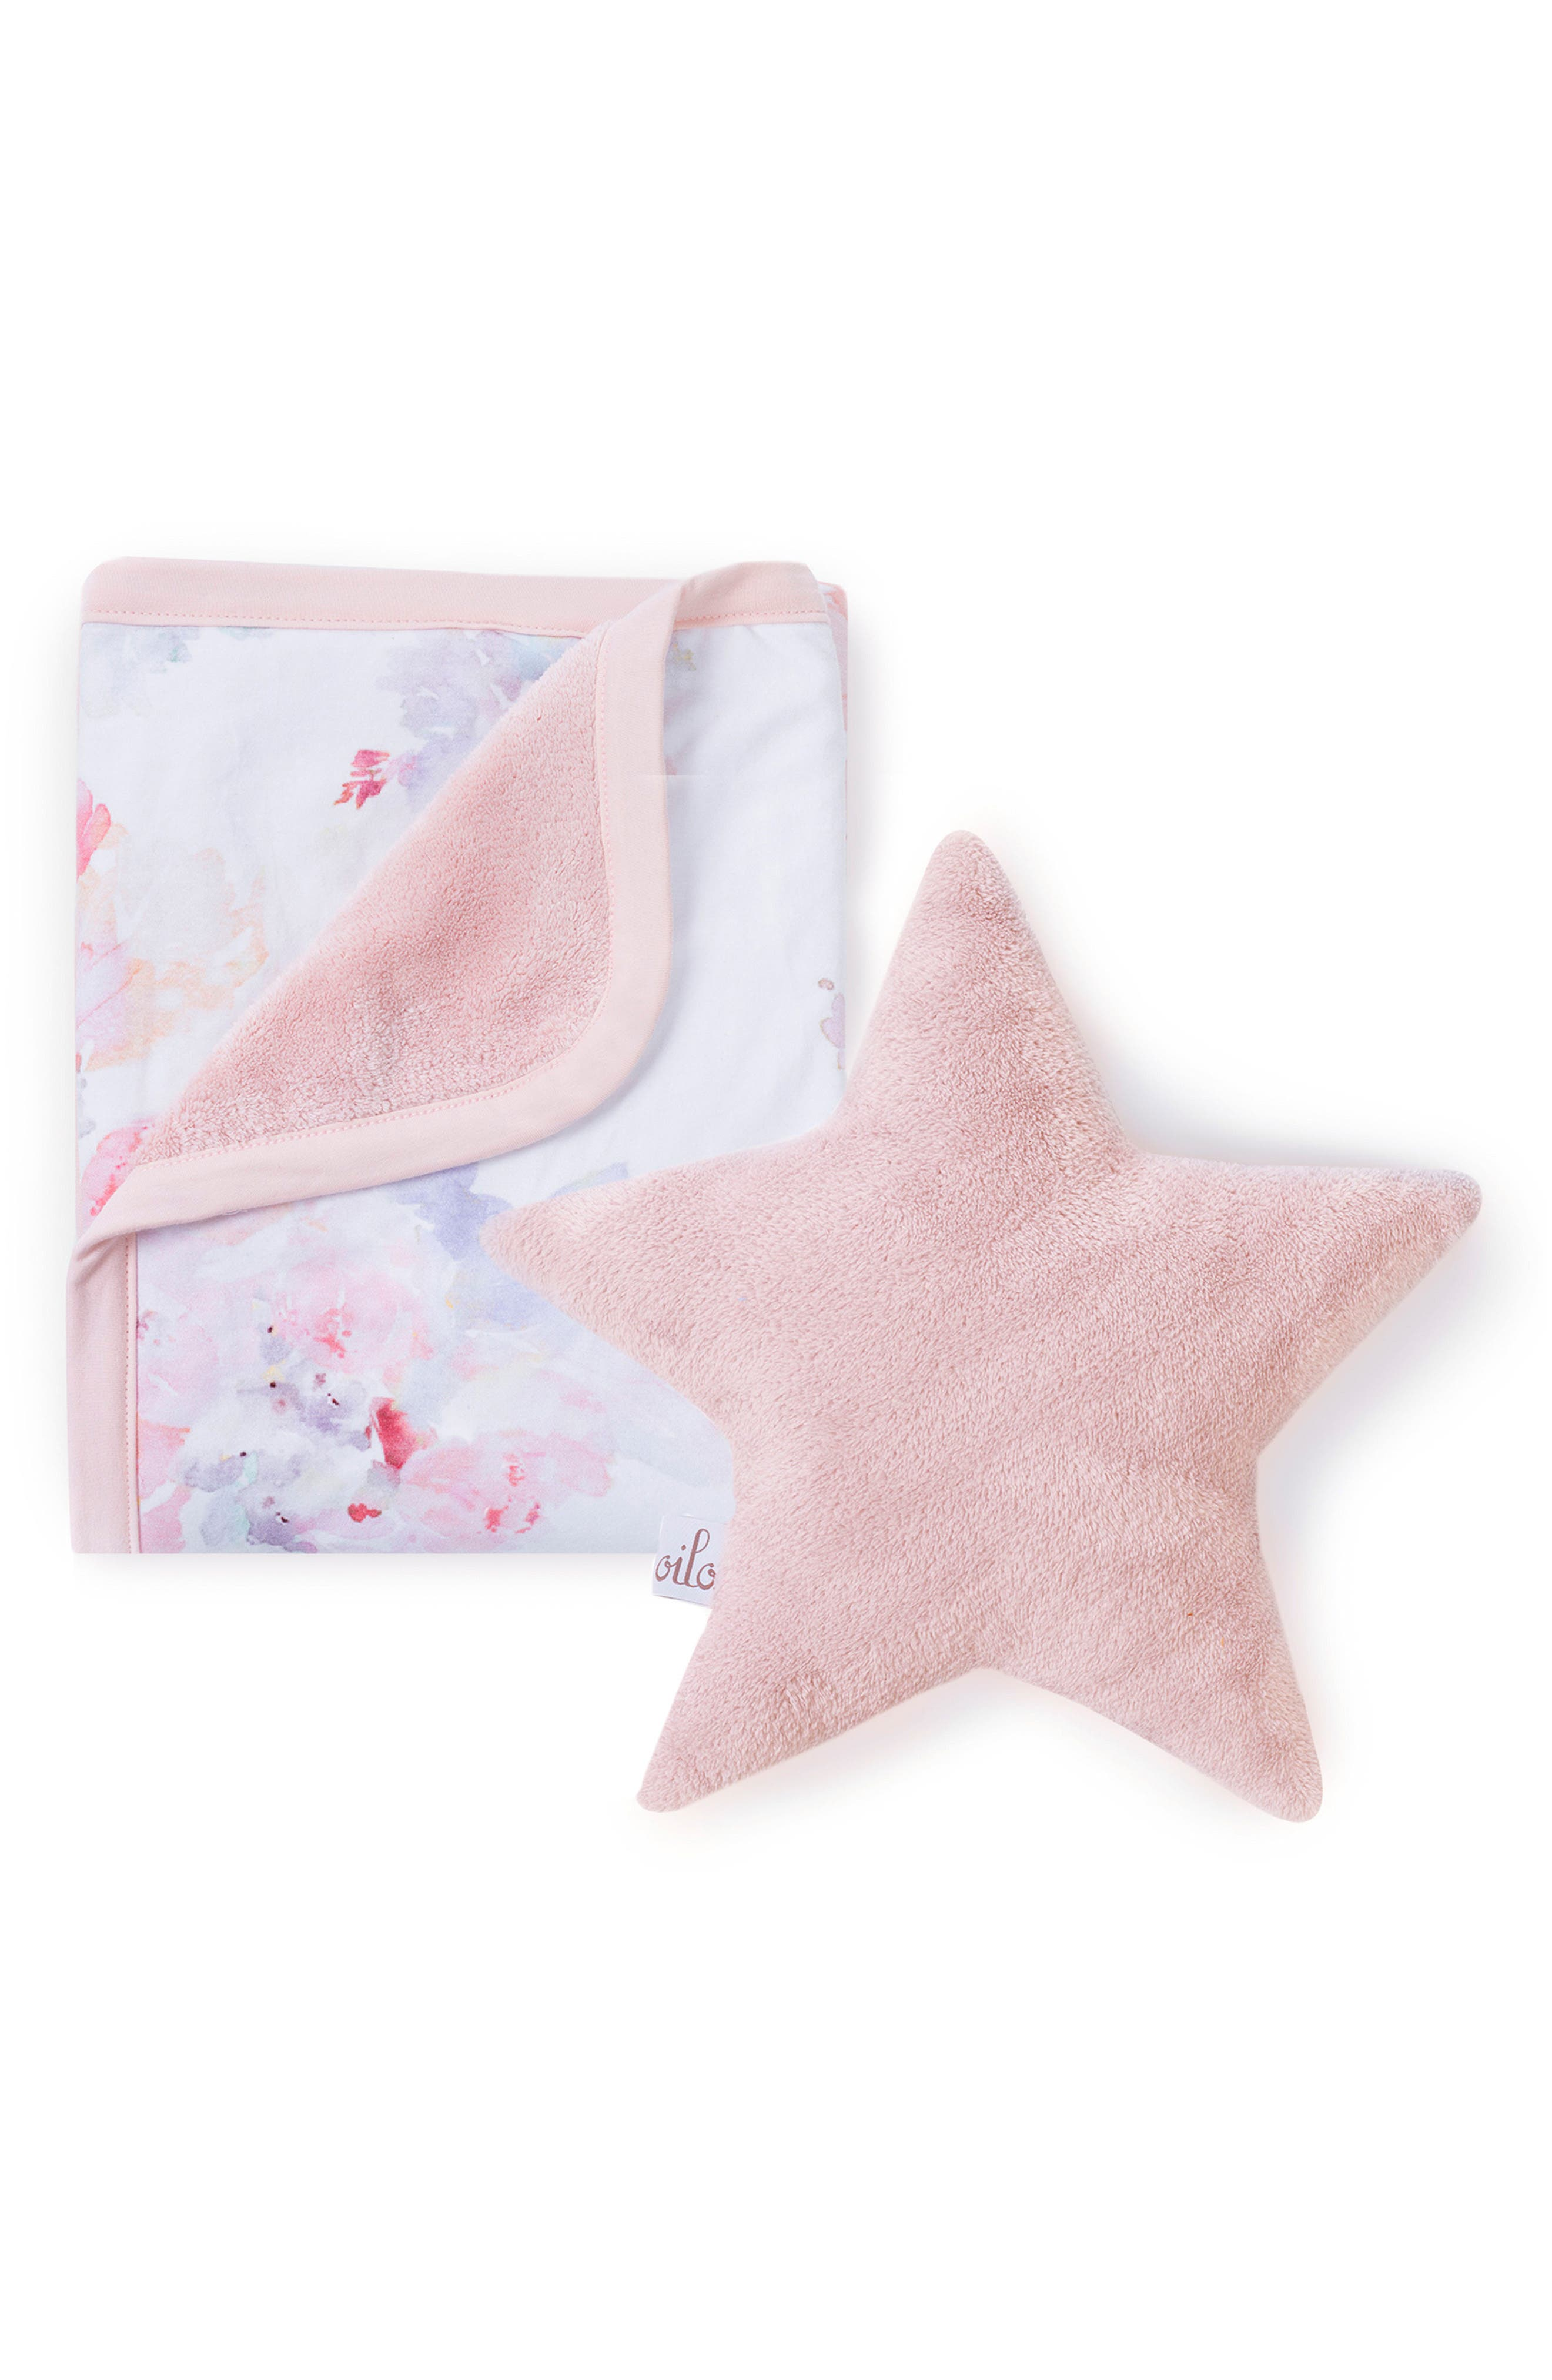 Prim Cuddle Blanket & Star Pillow Set,                             Main thumbnail 1, color,                             Prim